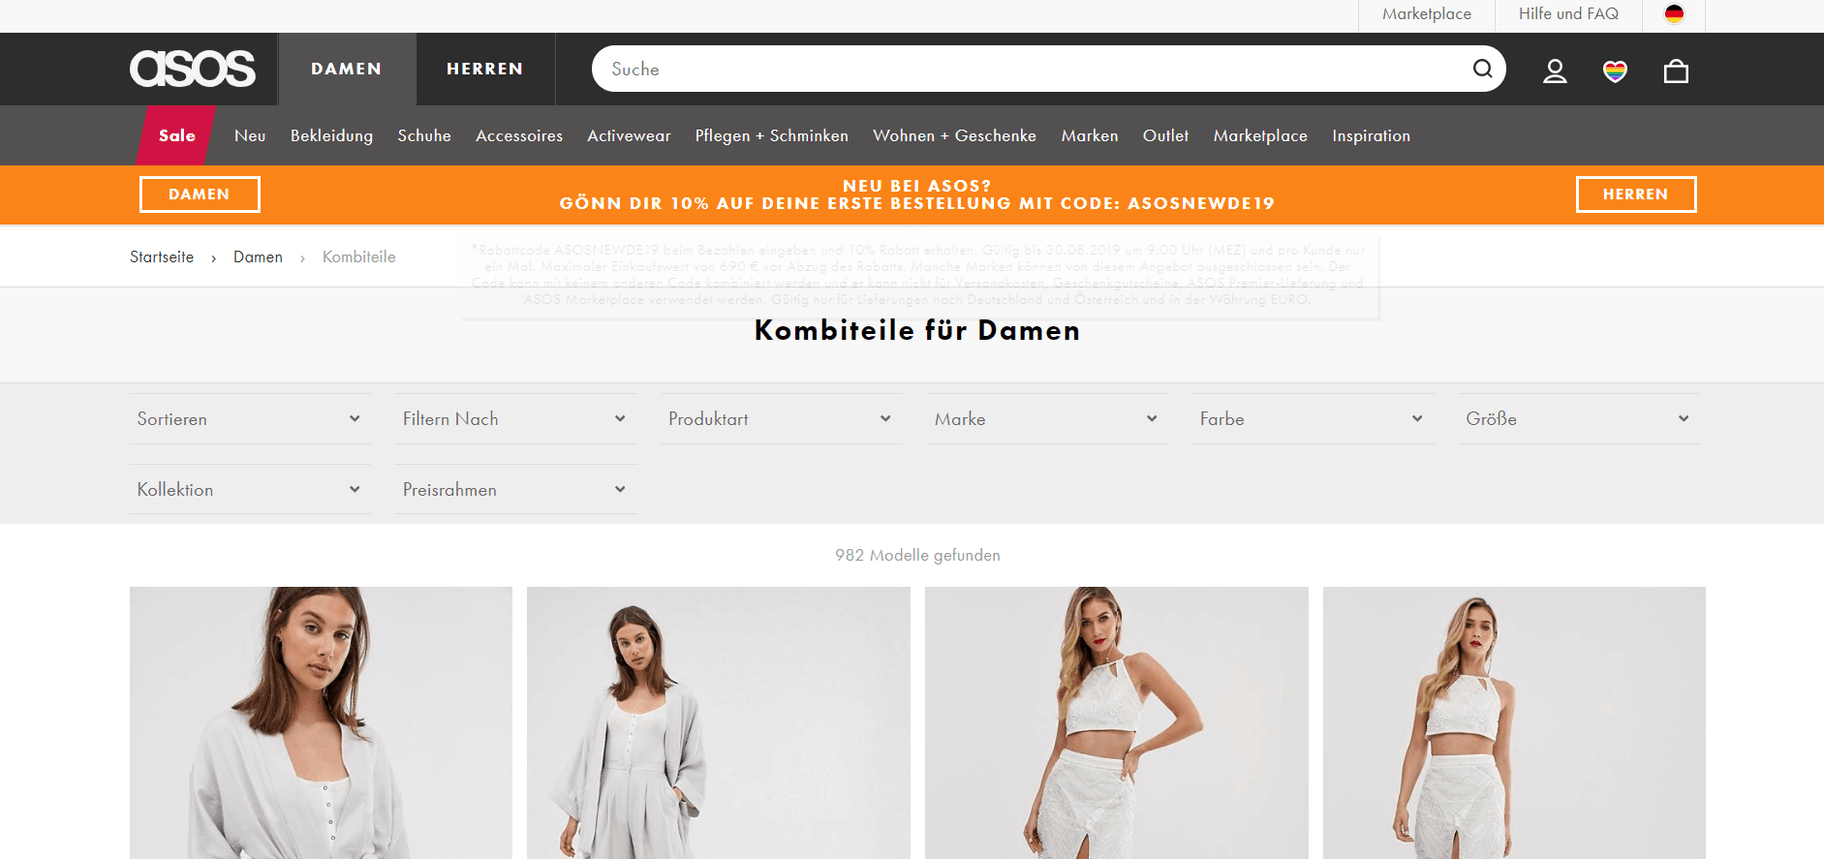 E-Commerce Vorteile & Nachteile - Asos Screenshot